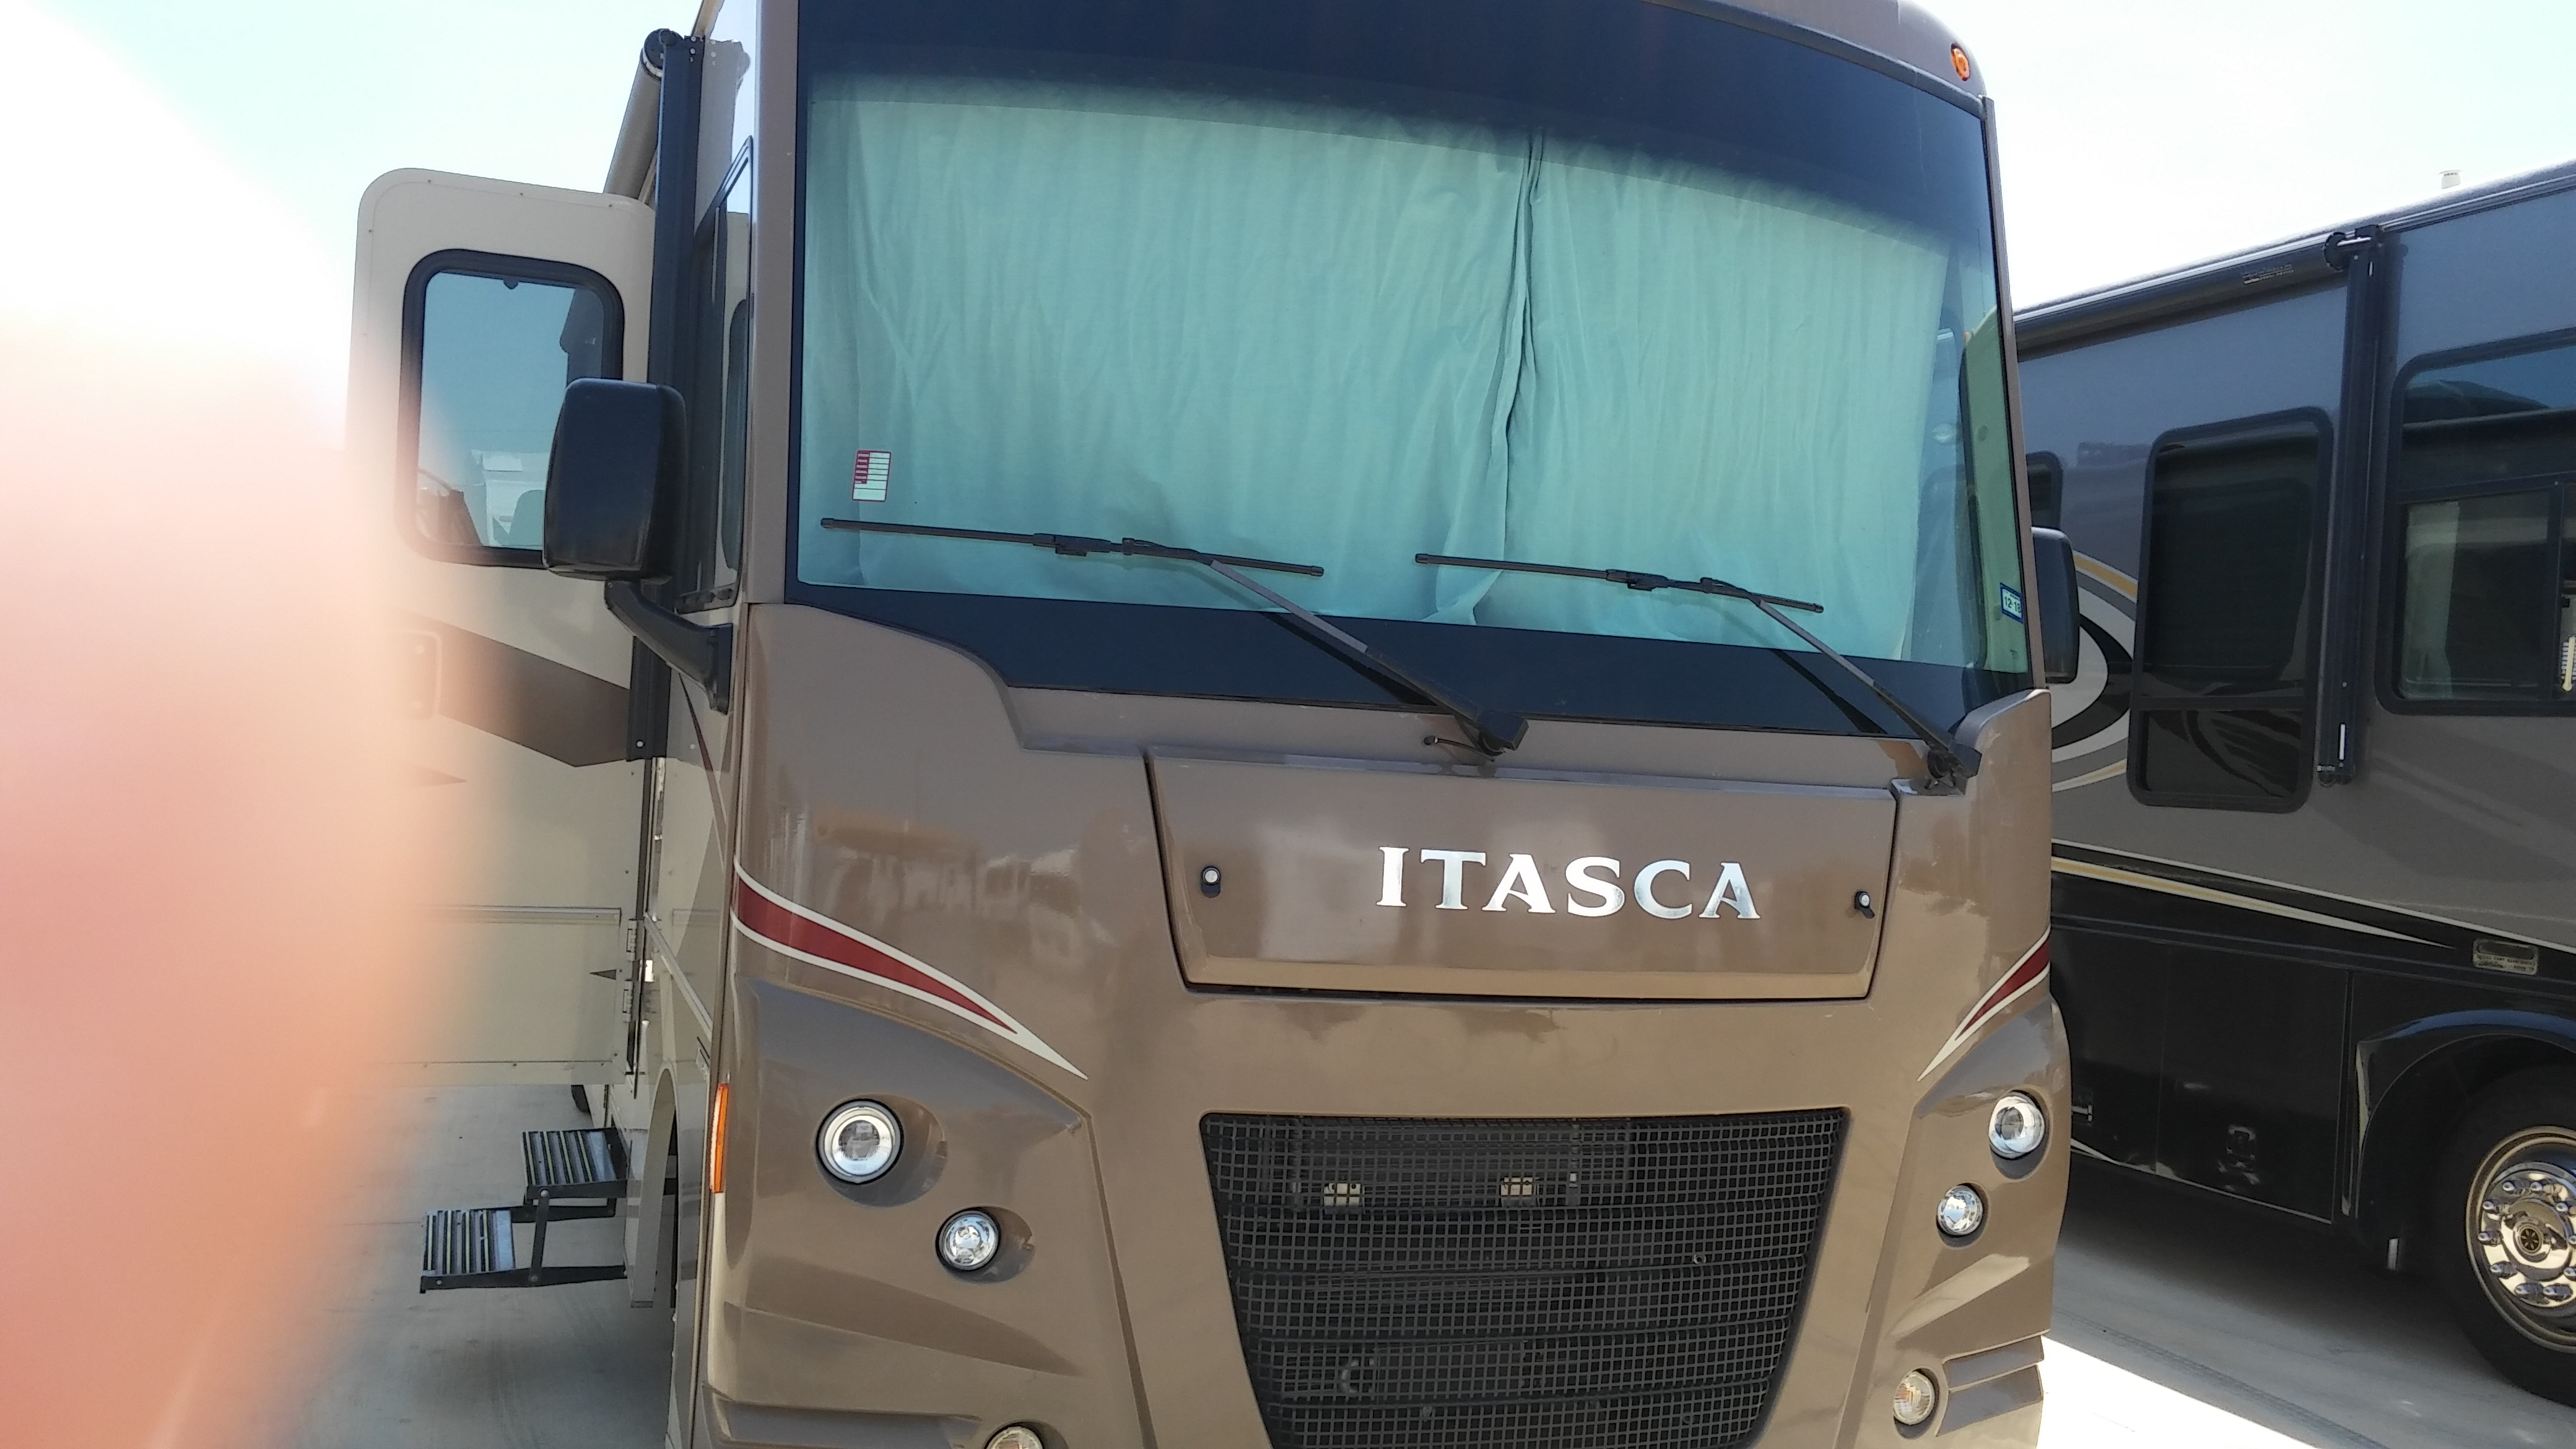 Itasca Sunstar 2016